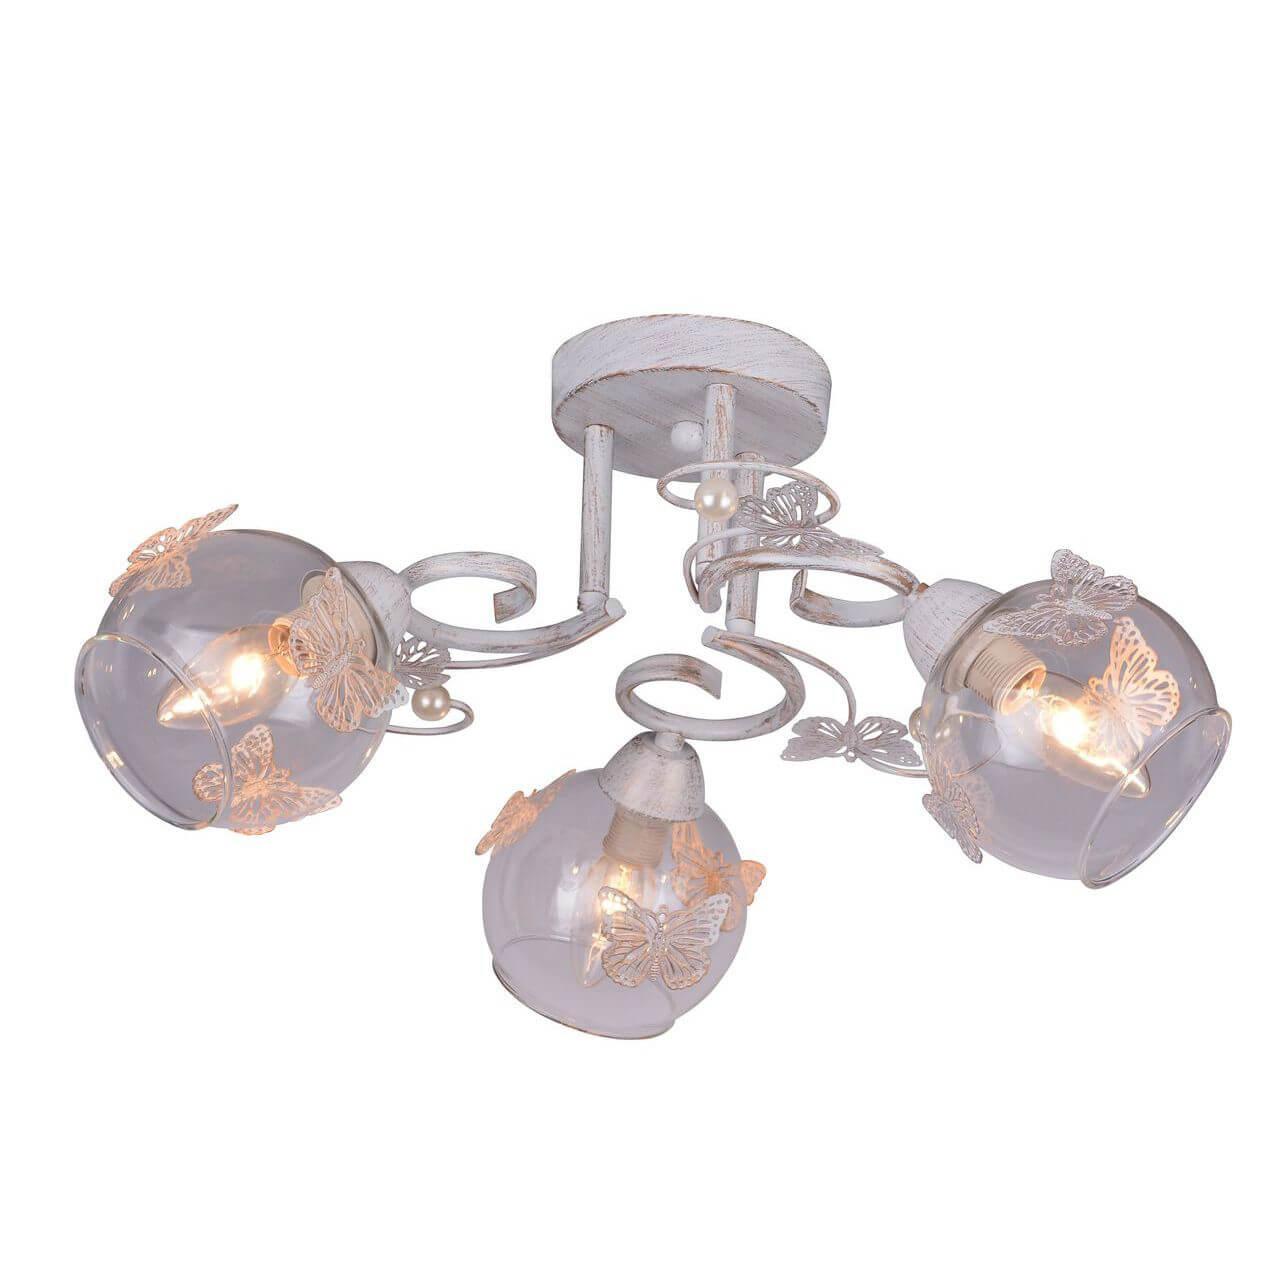 цена на Потолочная люстра Arte Lamp Alessandra A5004PL-3WG